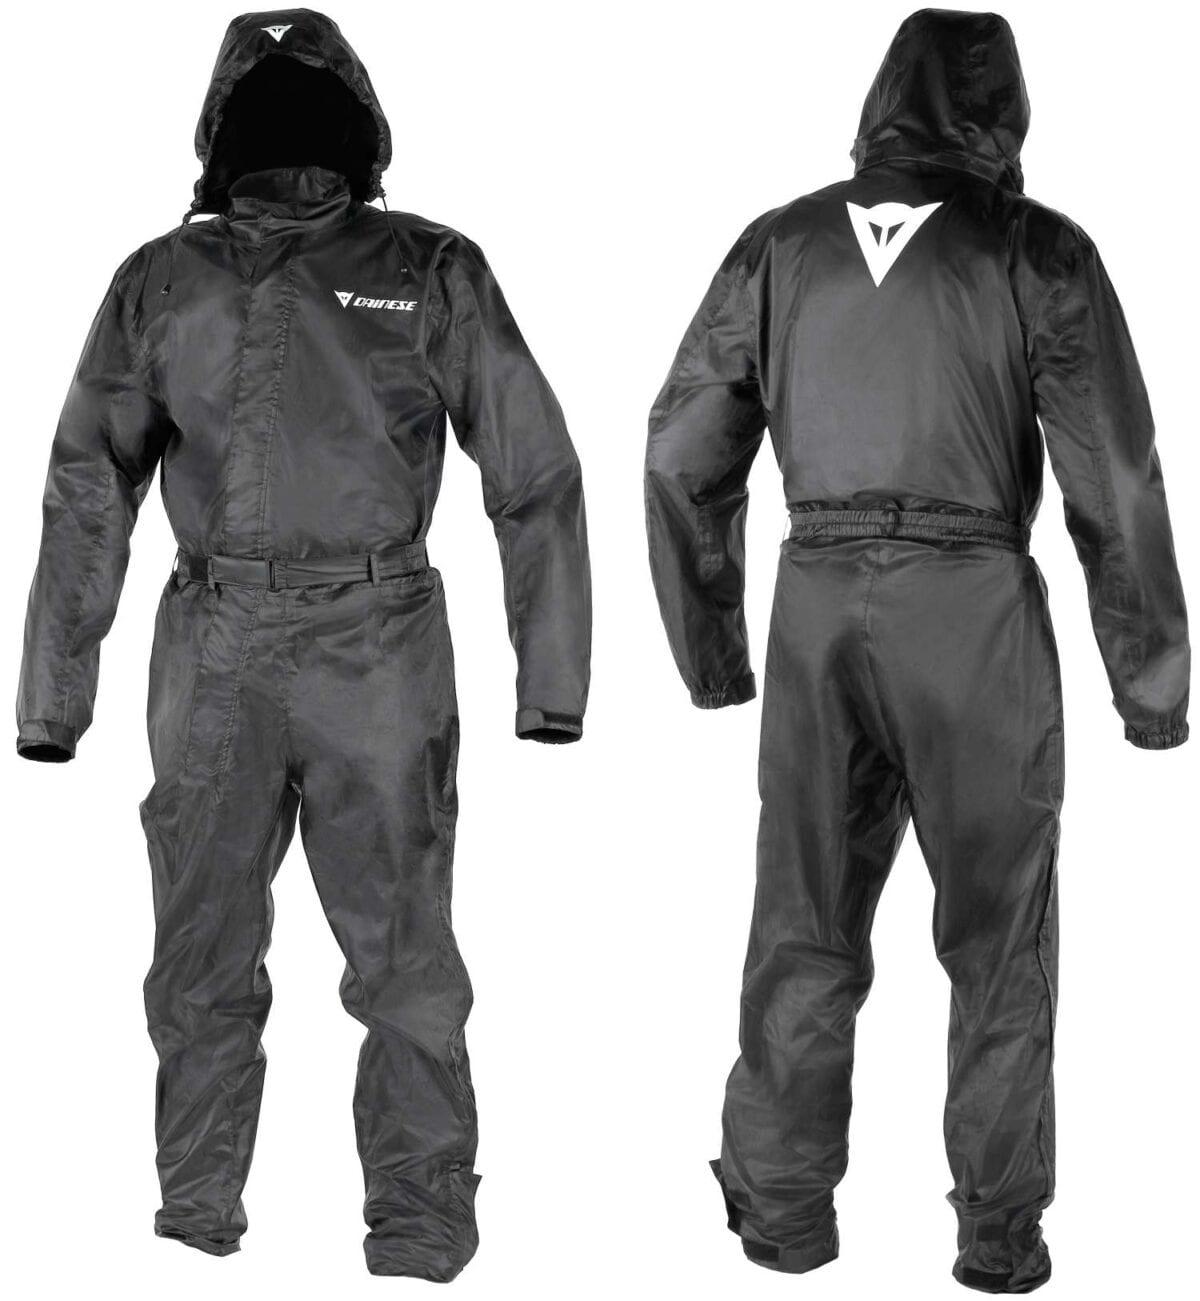 Dainese D Crust suit